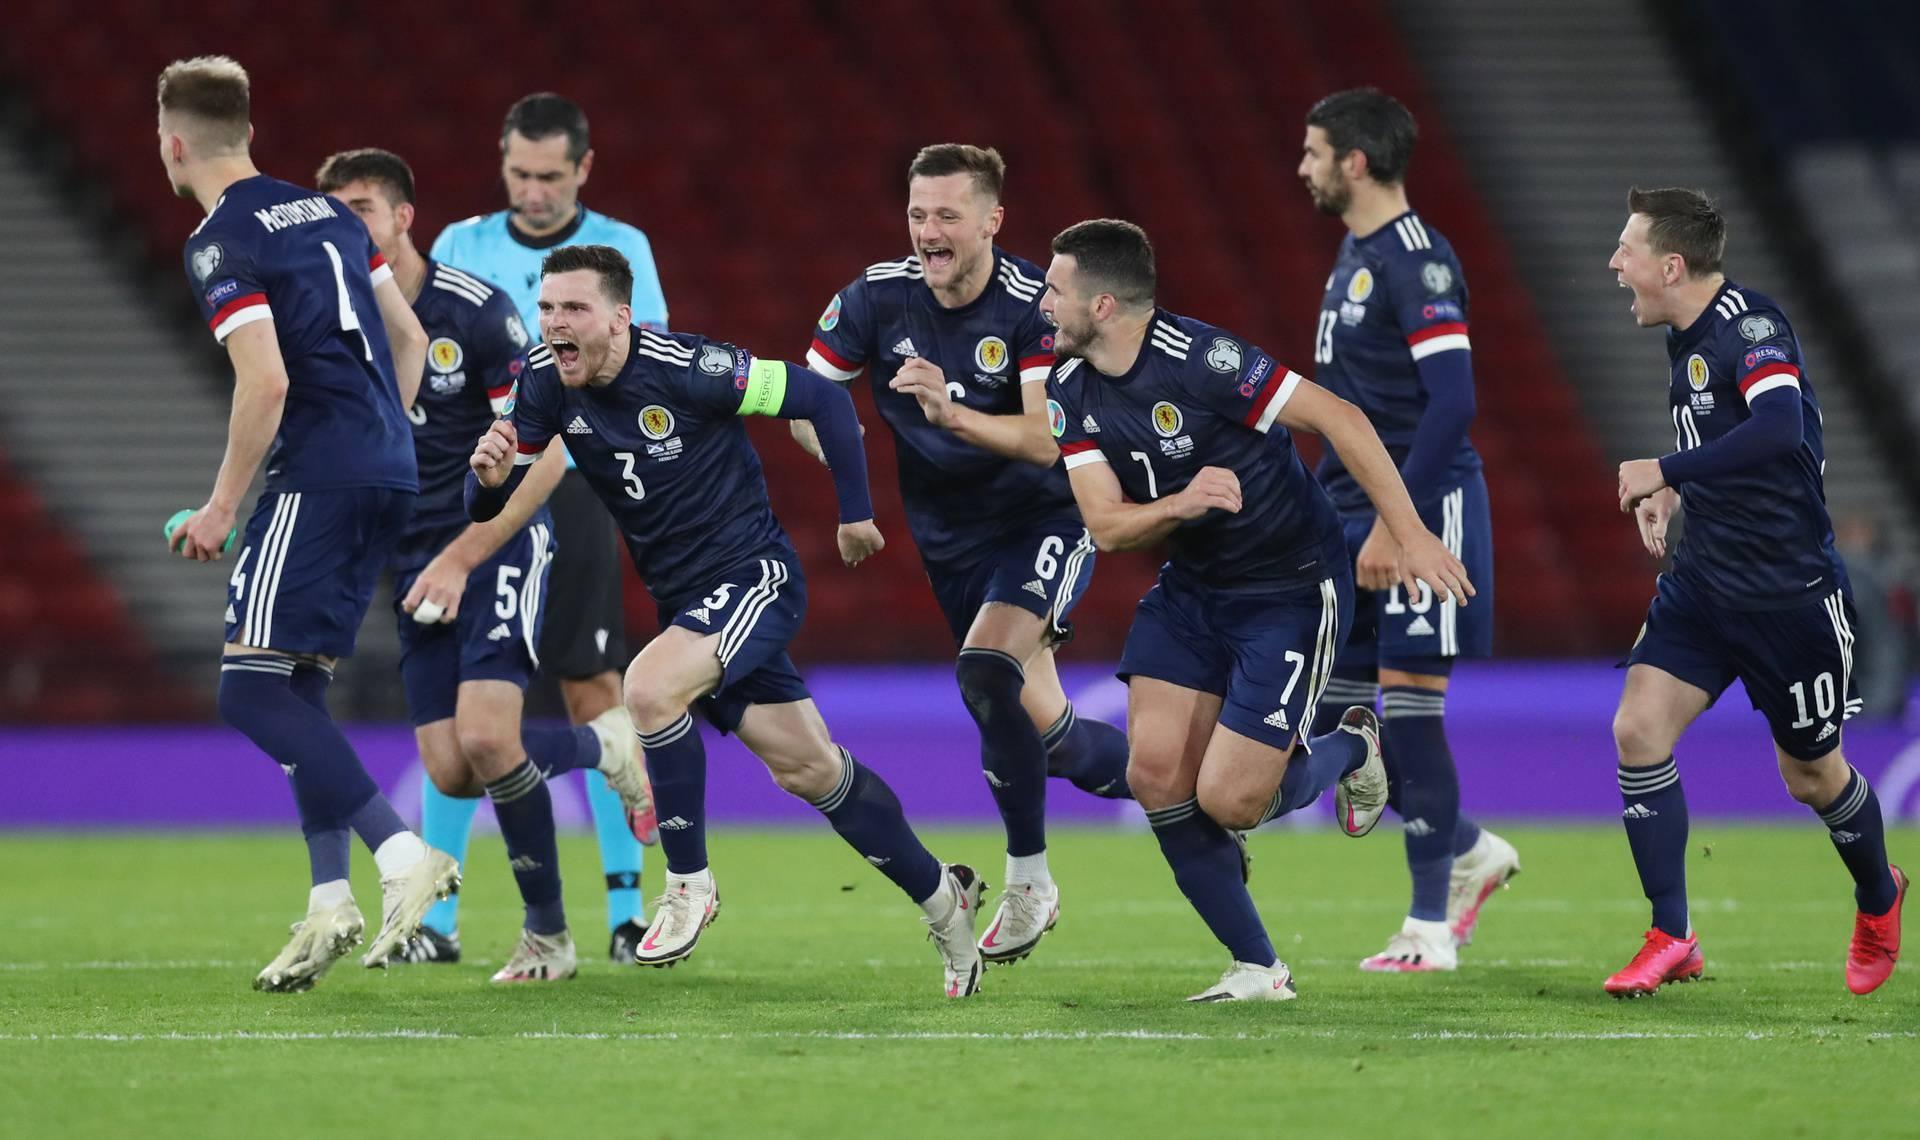 Euro 2020 Qualification Play off - Scotland v Israel